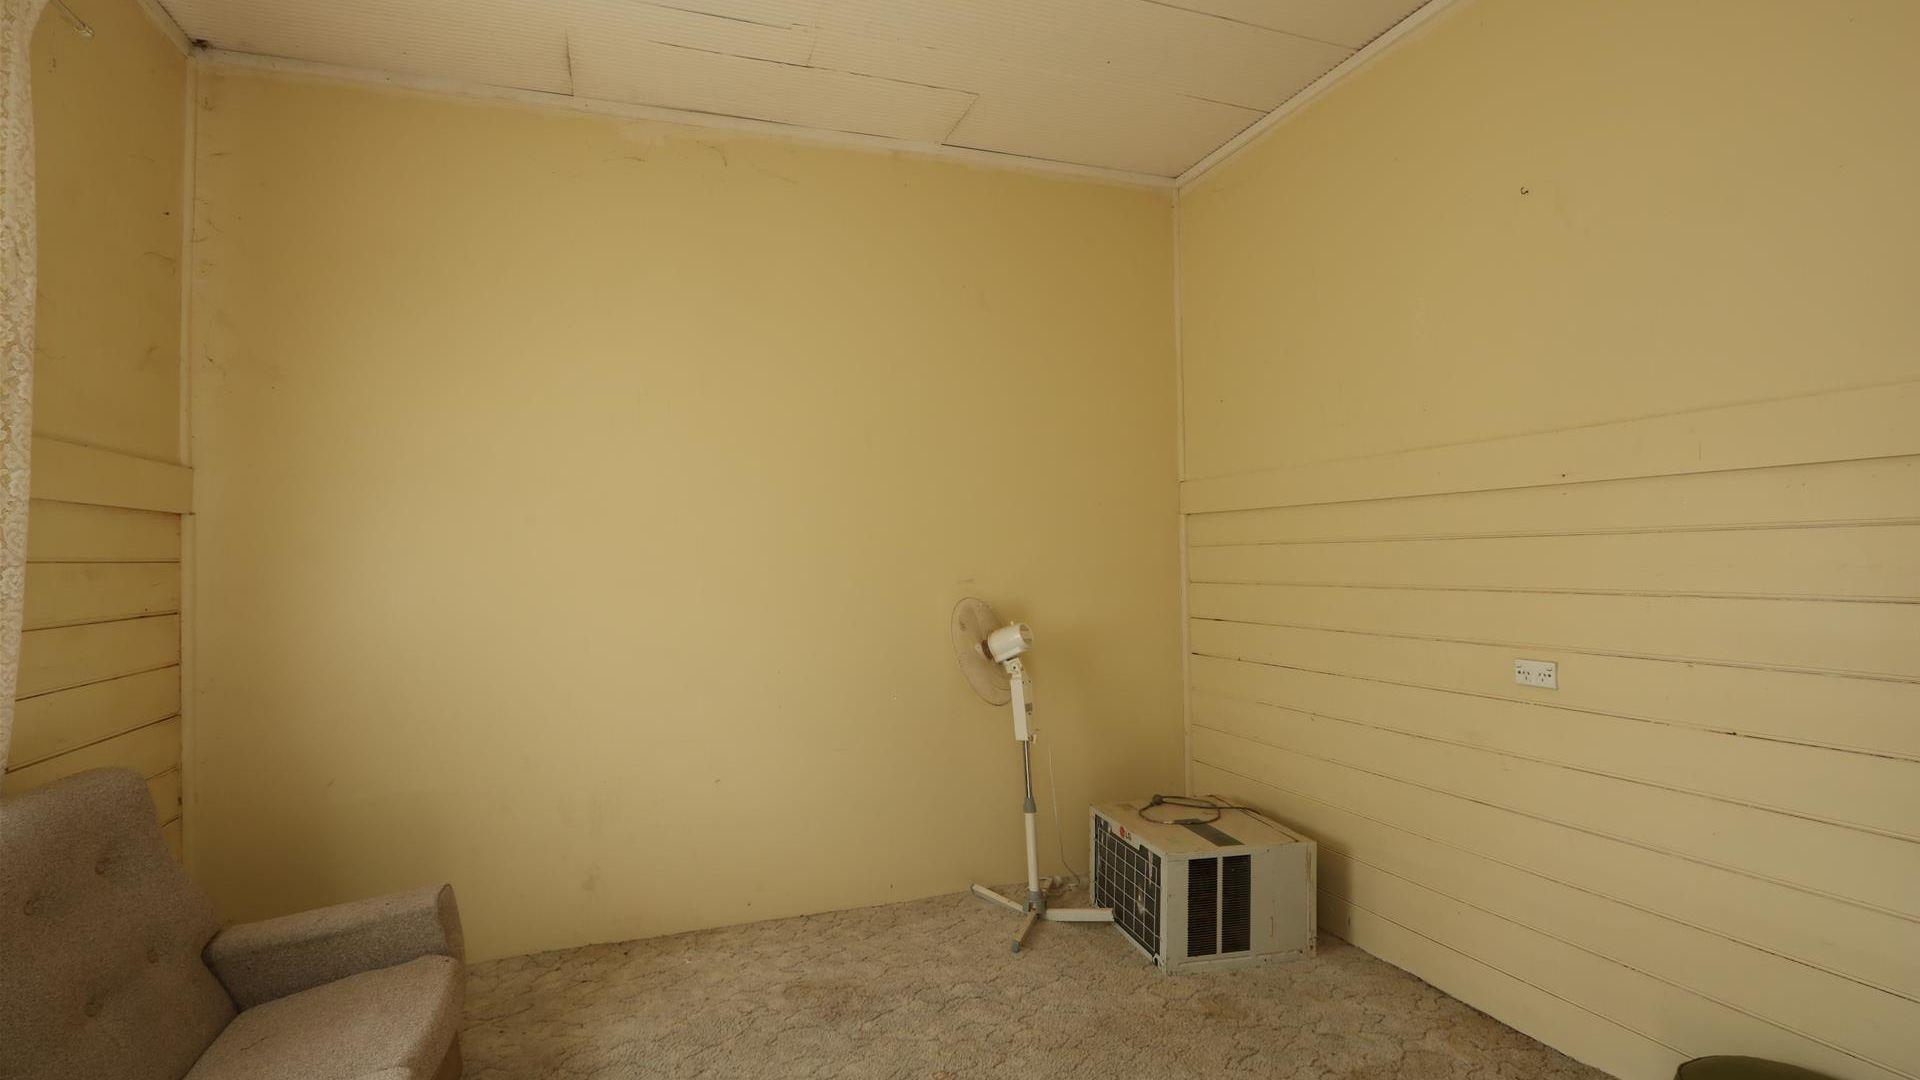 39-41 Blende Street, Broken Hill NSW 2880, Image 2